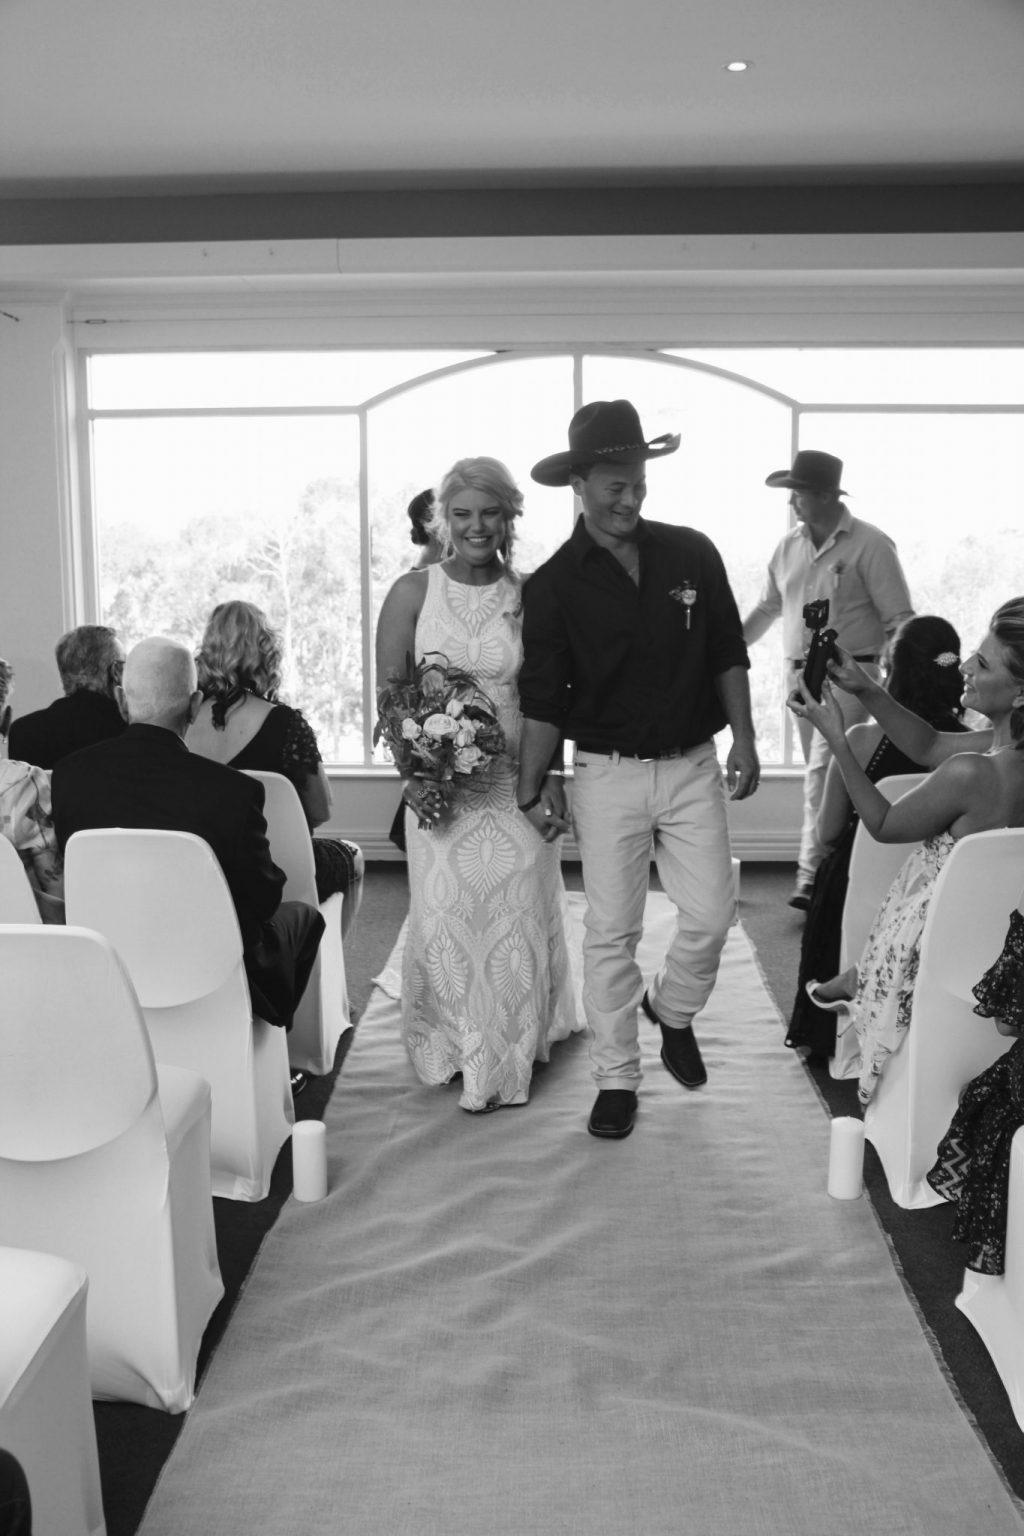 Wedding couple walking down the aisle